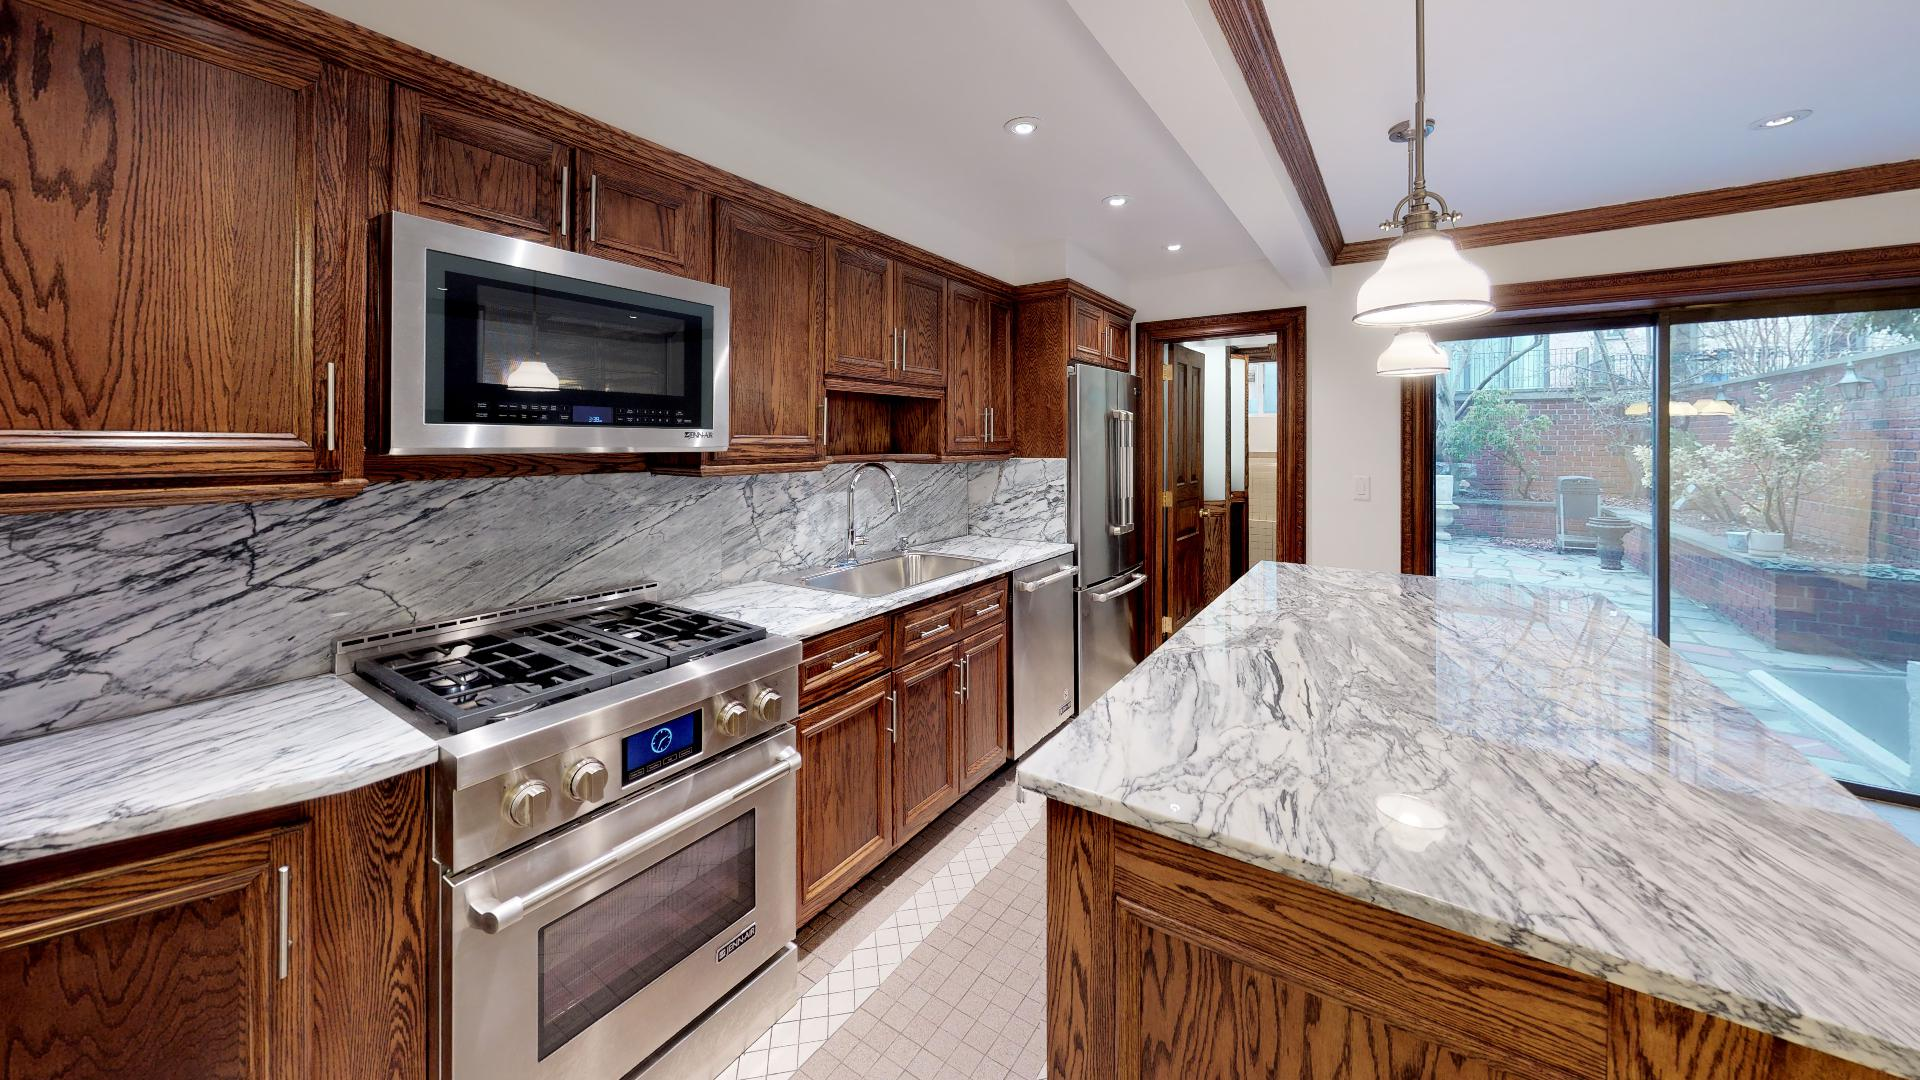 Real Estate Photos | Brooklyn, NY